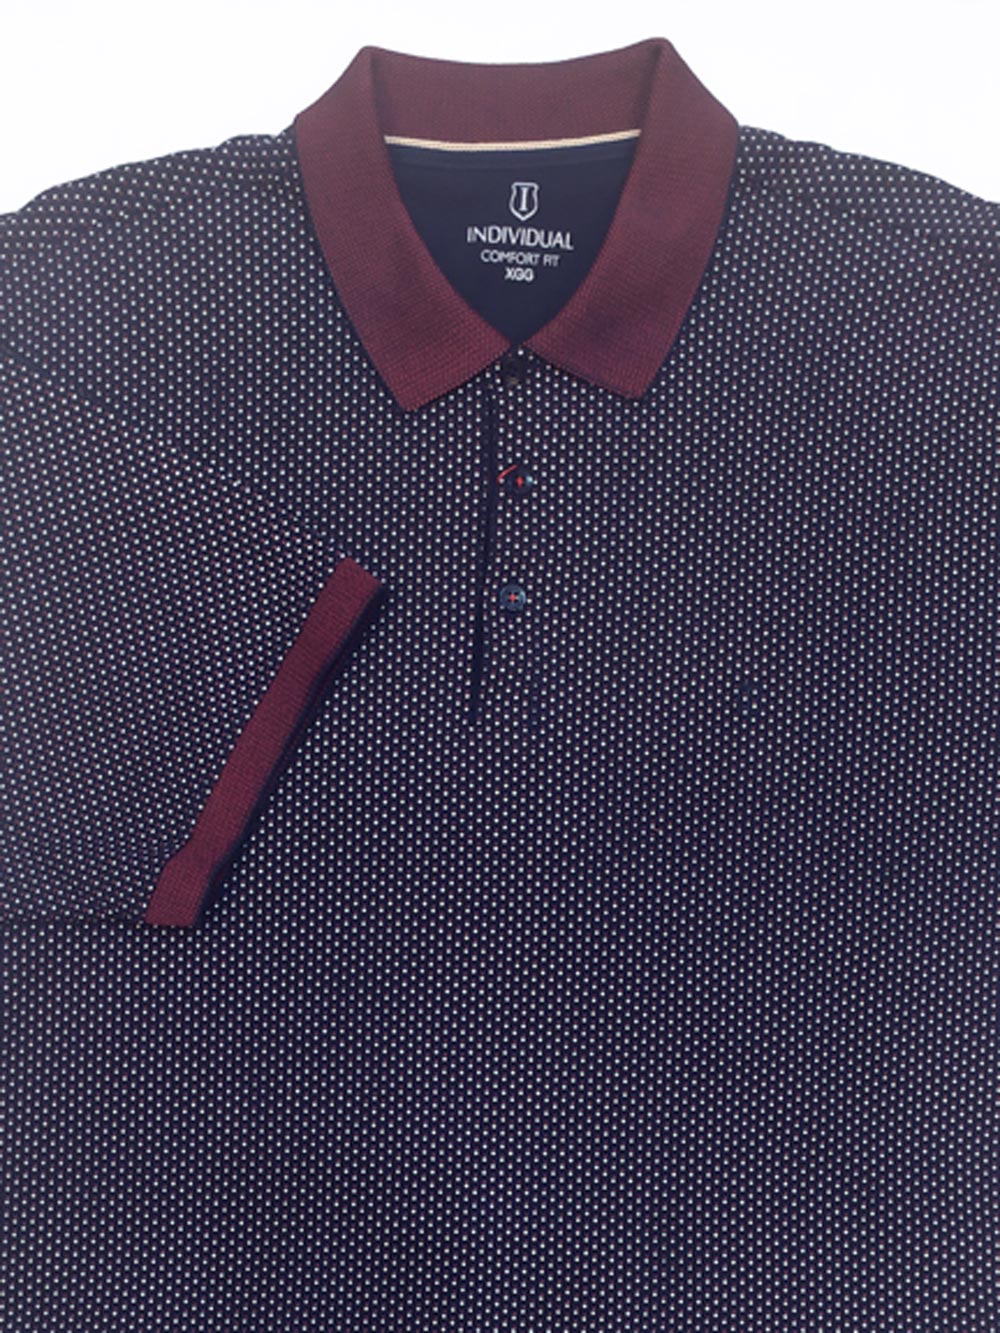 Camisa Polo Masculina Comfort Fit Poá Gola Trabalhada Individual